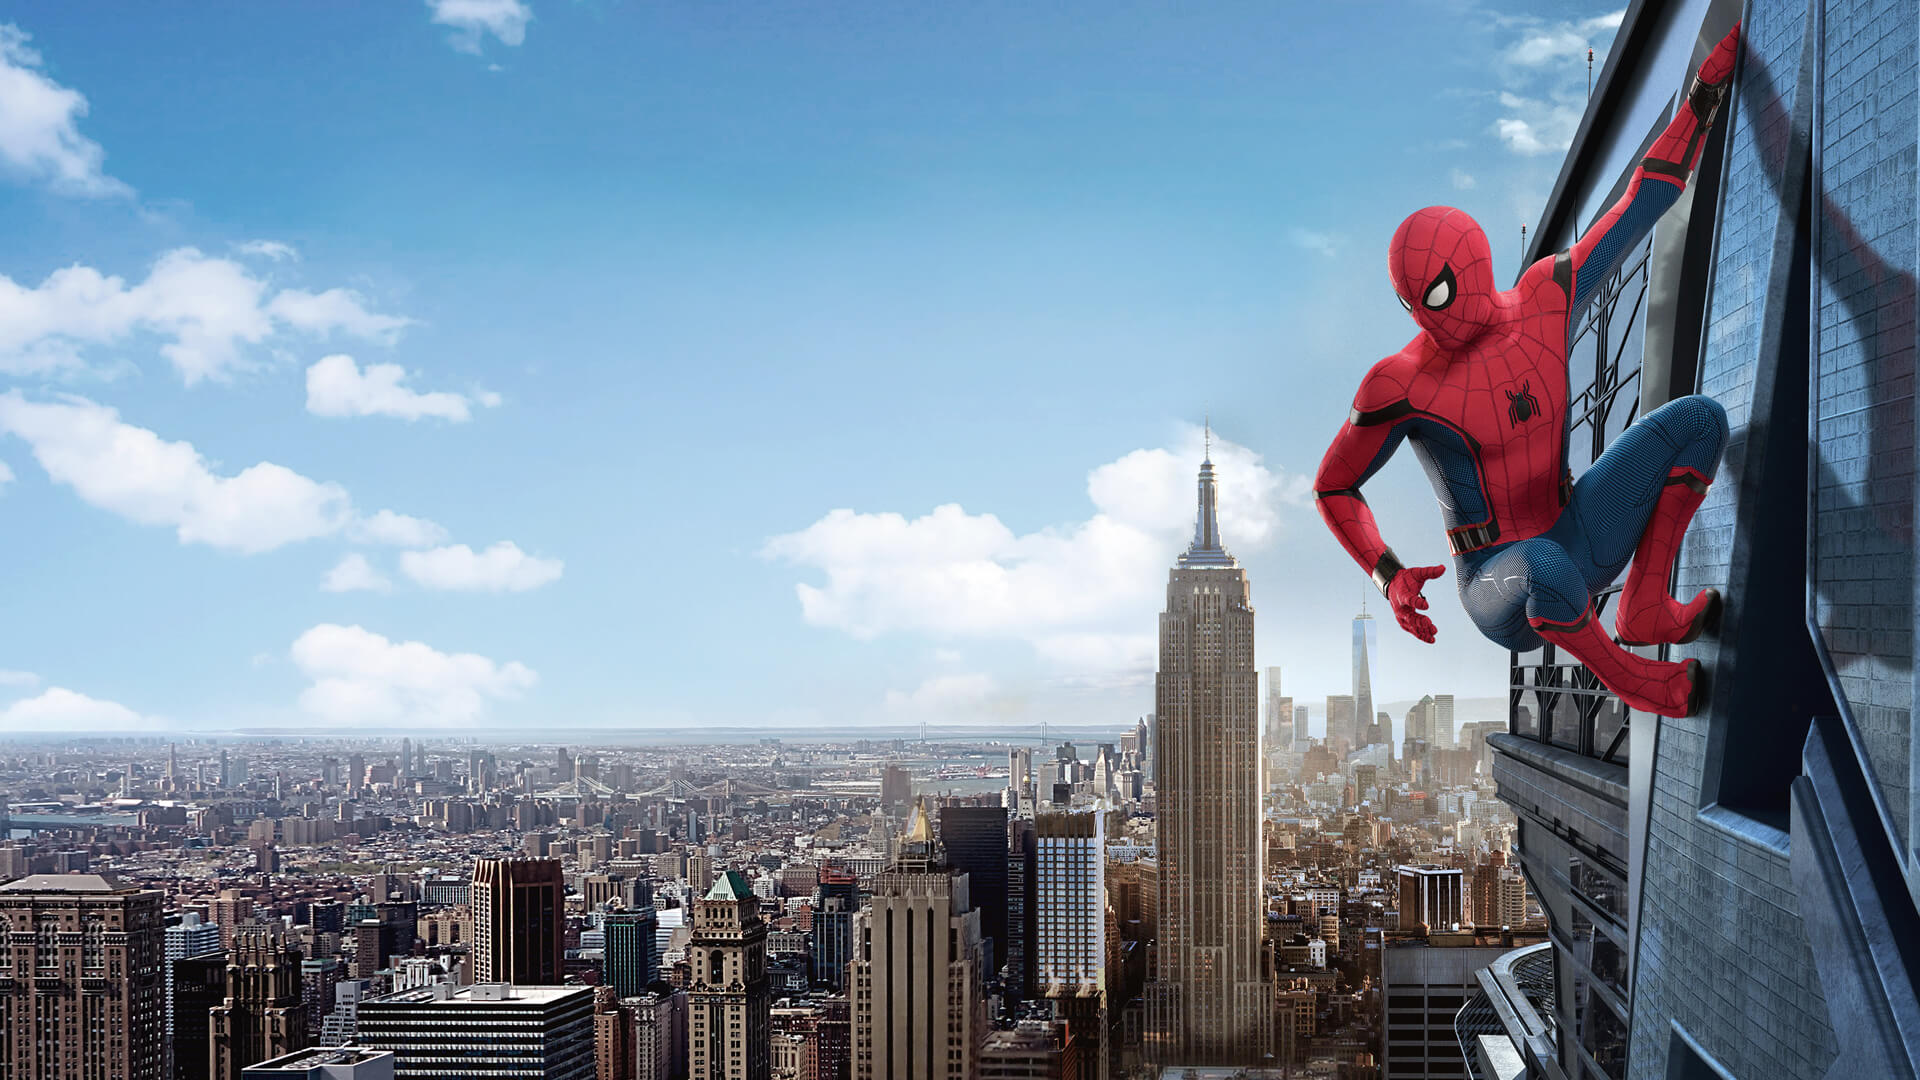 spider-man-homecoming-4k-wallpaper-4